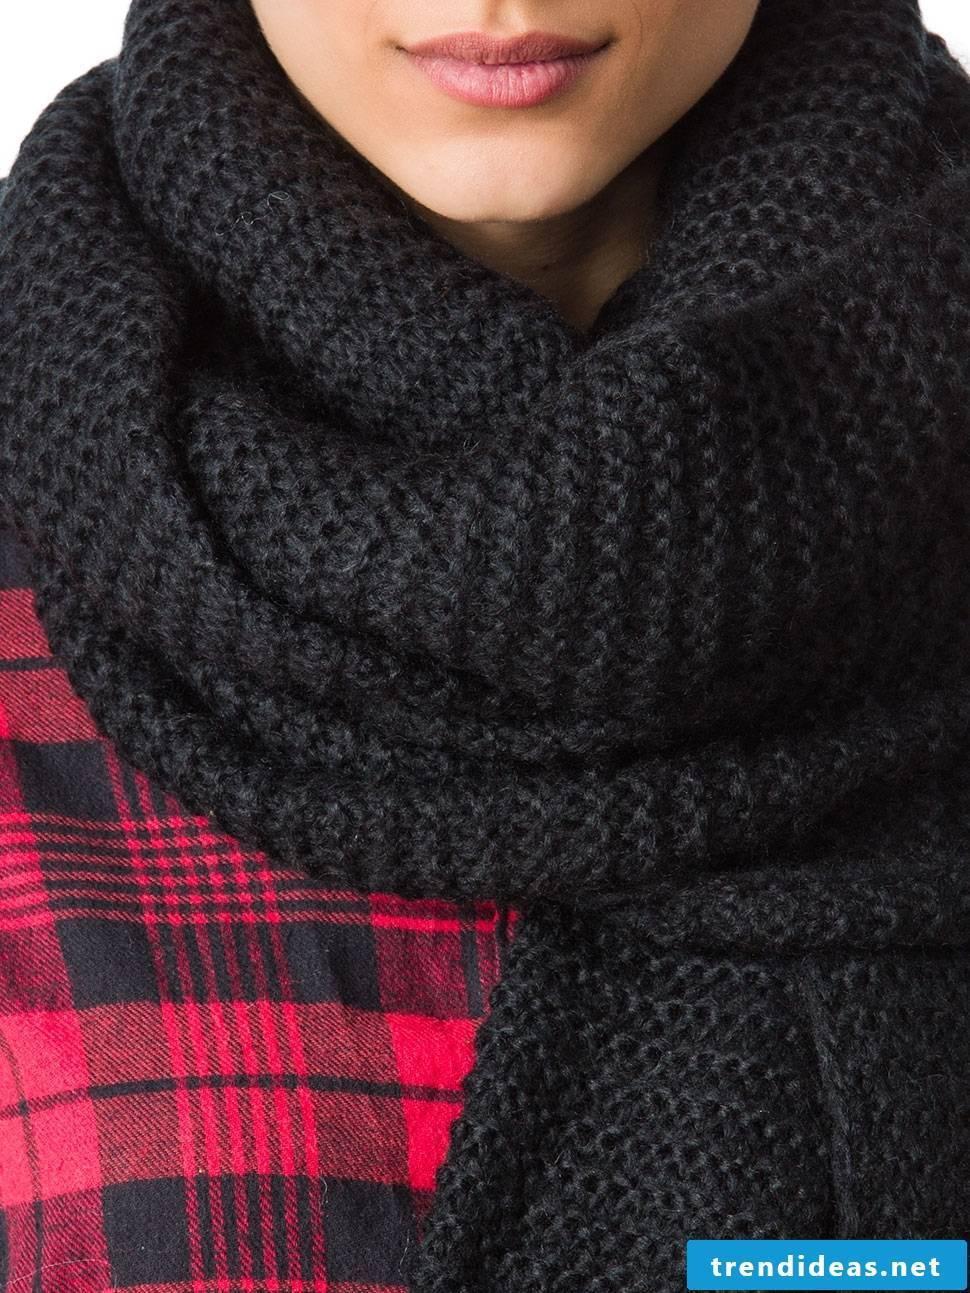 Crochet great ideas for a scarf black